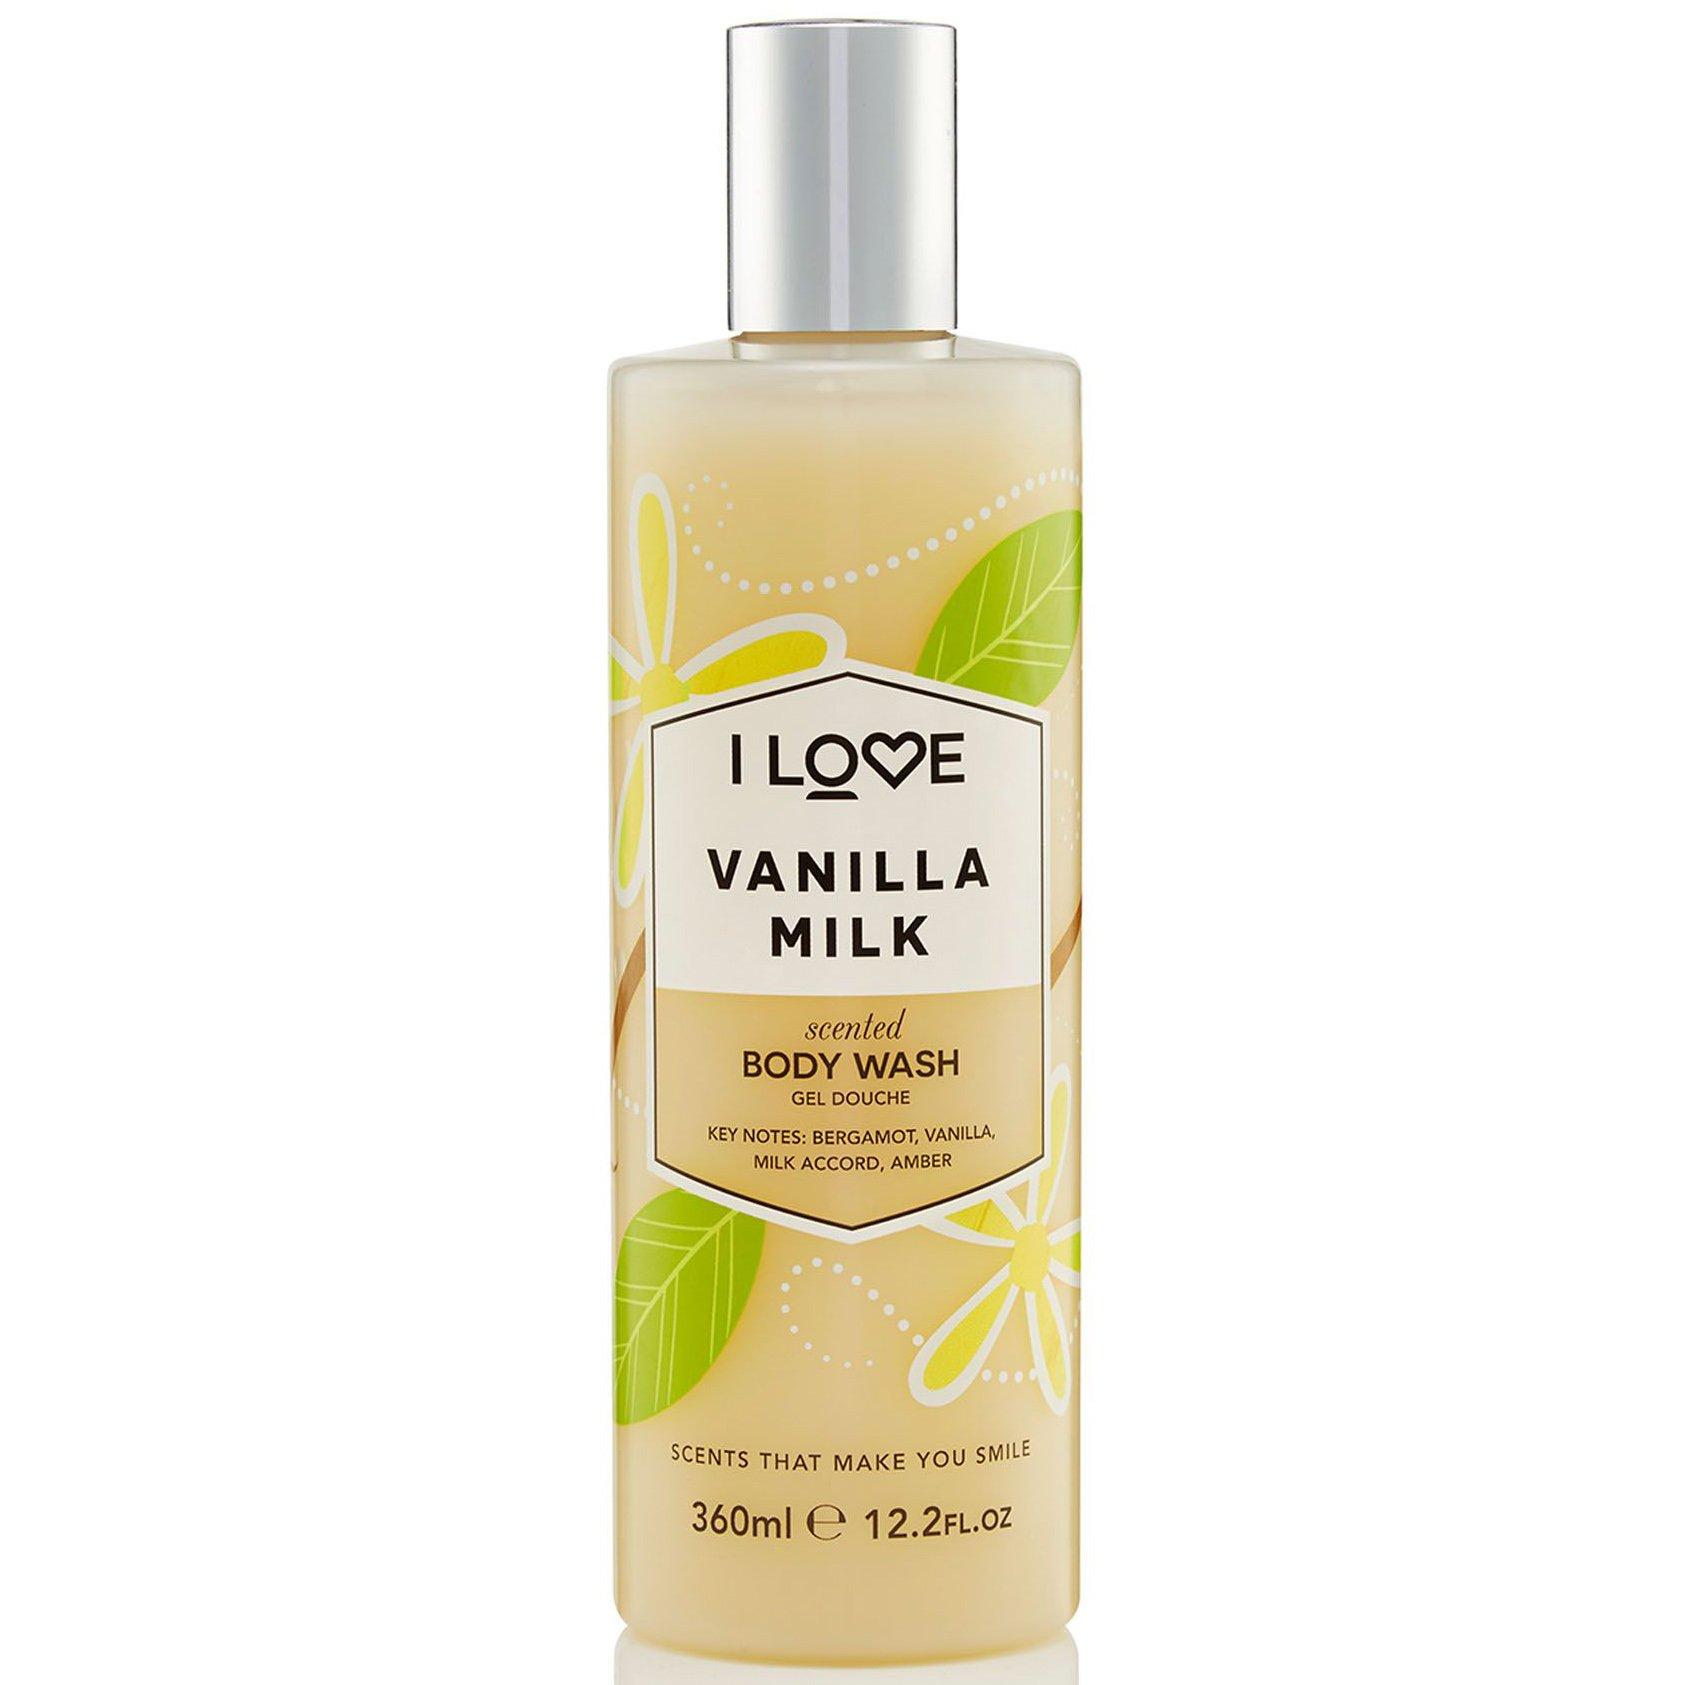 I love… Vanilla Milk Body Wash Κρεμώδες Αφρόλουτρο με Εκχυλίσματα Φρούτων για Απαλή & Μεταξένια Επιδερμίδα 360ml